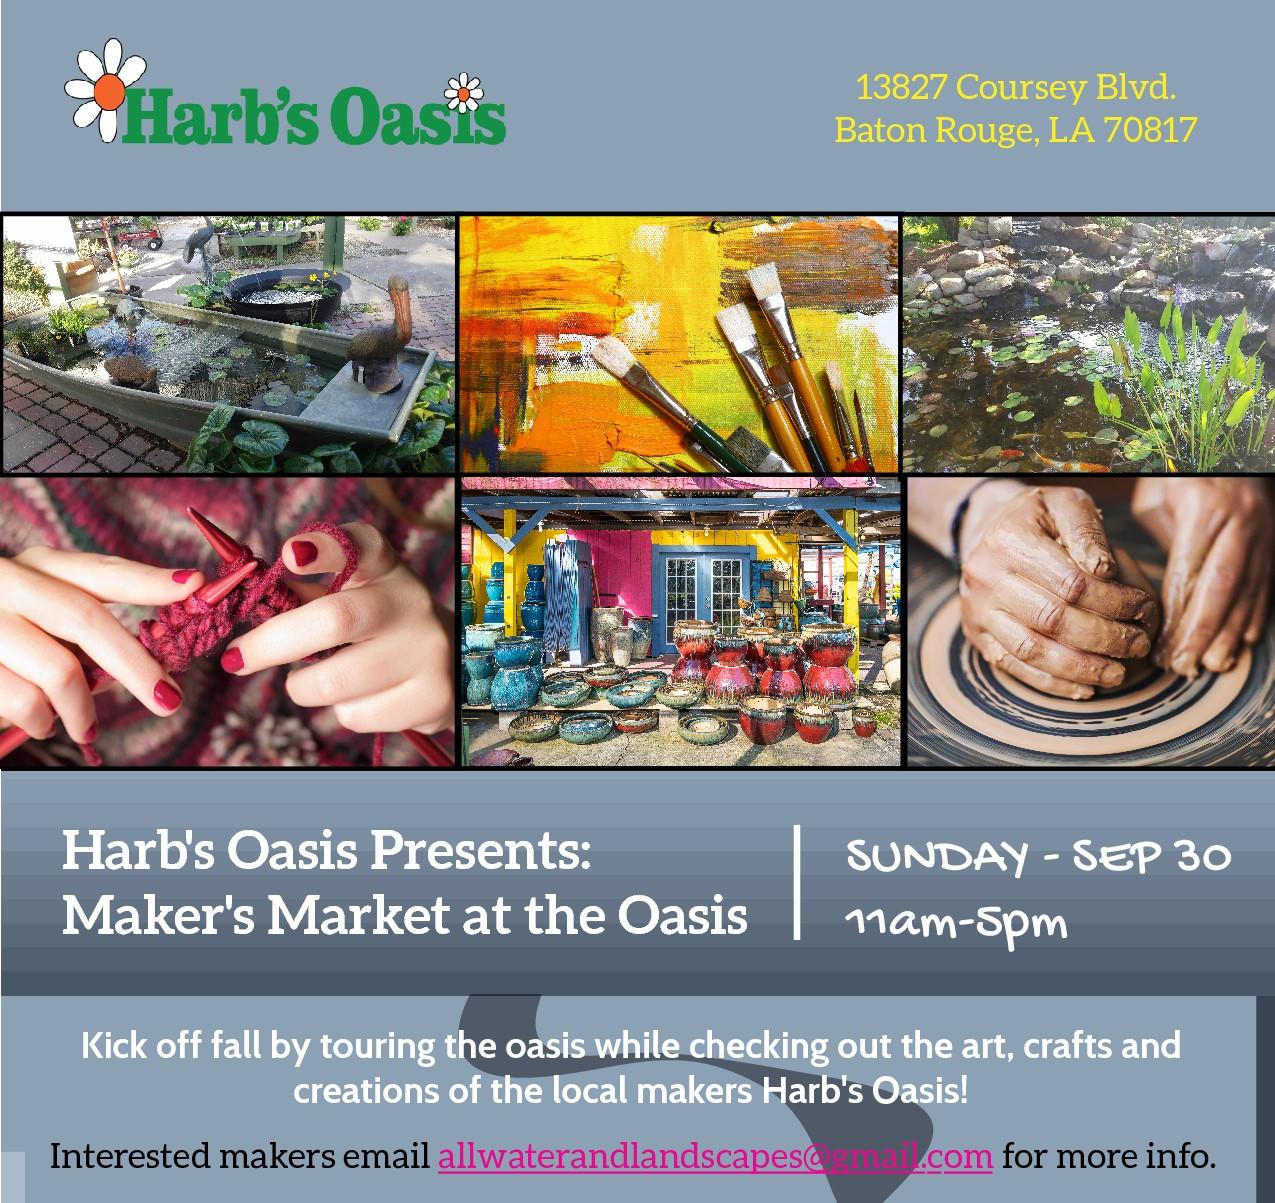 Maker's Market at the Oasis Flyer - September 2018.jpg